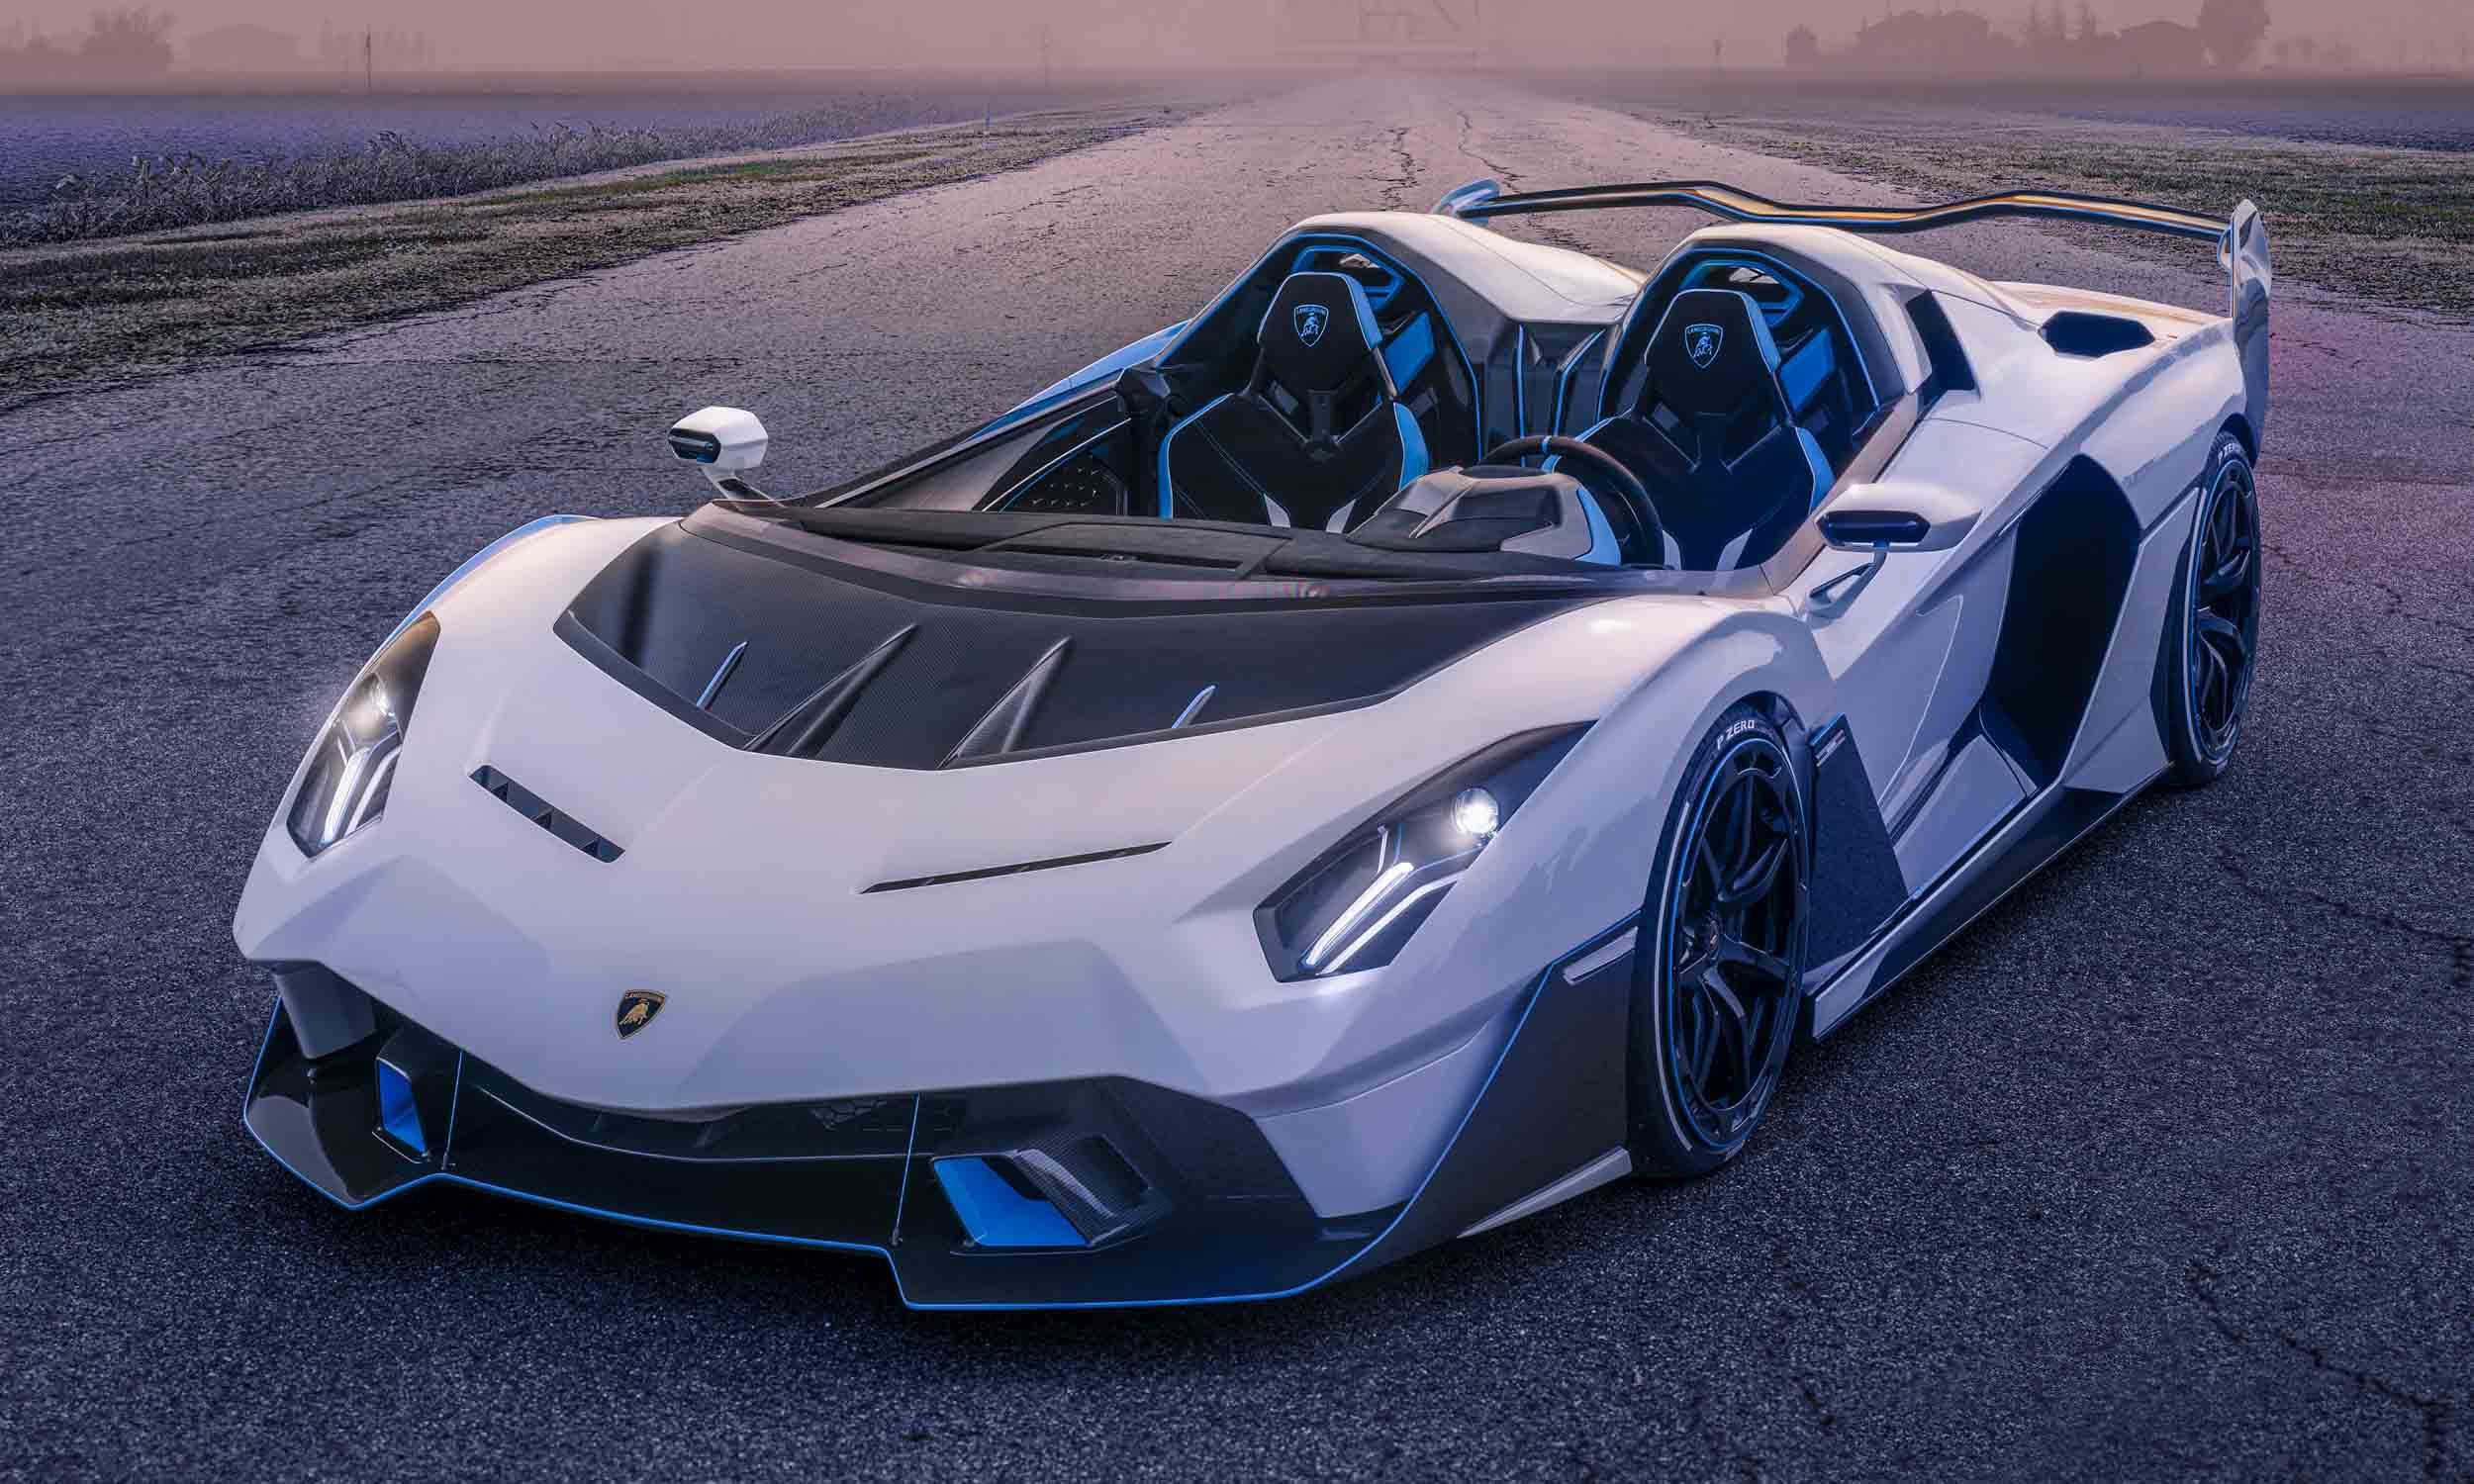 Lamborghini SC20: A New Model — For One Customer